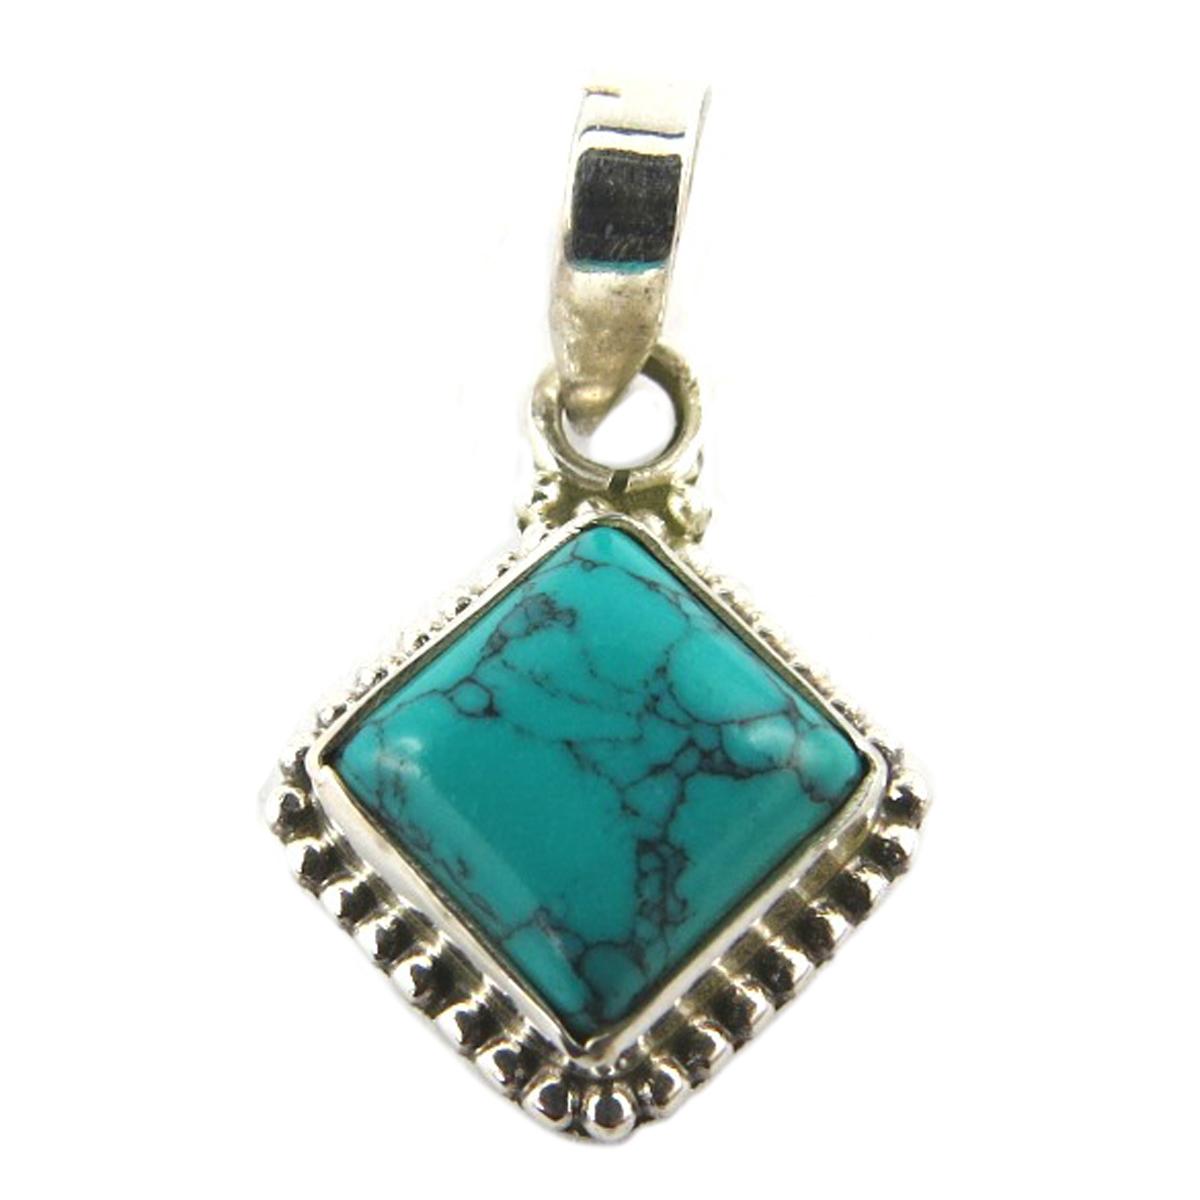 Pendentif Argent artisanal \'Heaven\' turquoise - 13x13 mm - [Q9863]